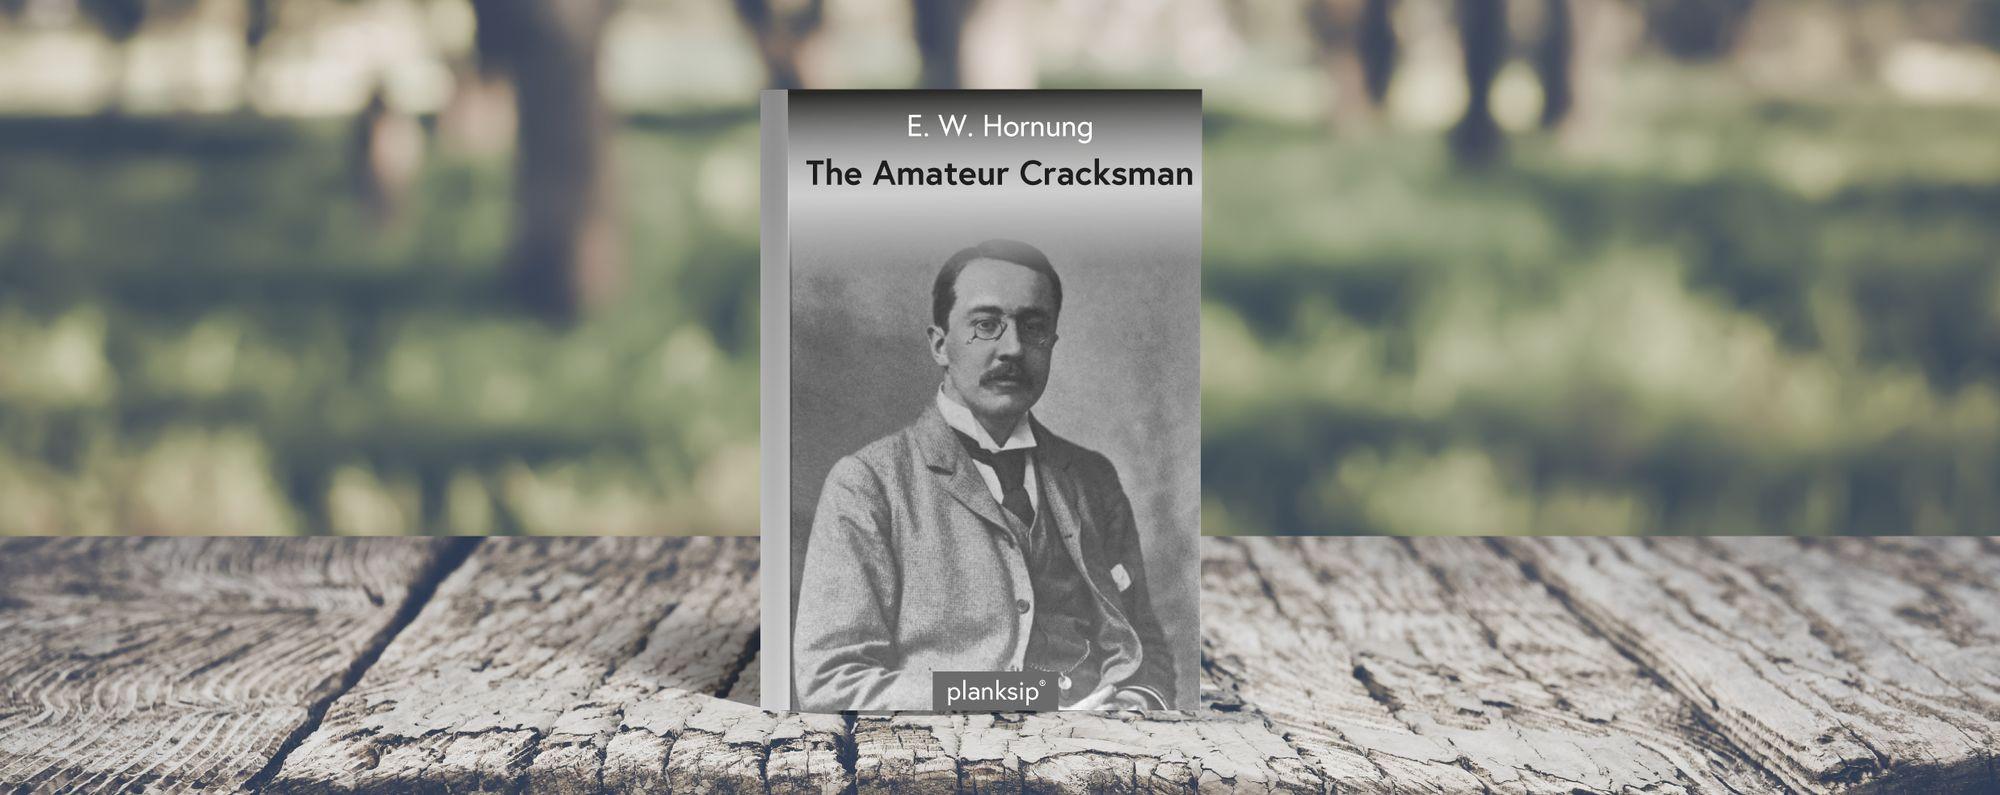 The Amateur Cracksman by E.W. Hornung (1866-1921). Published by planksip